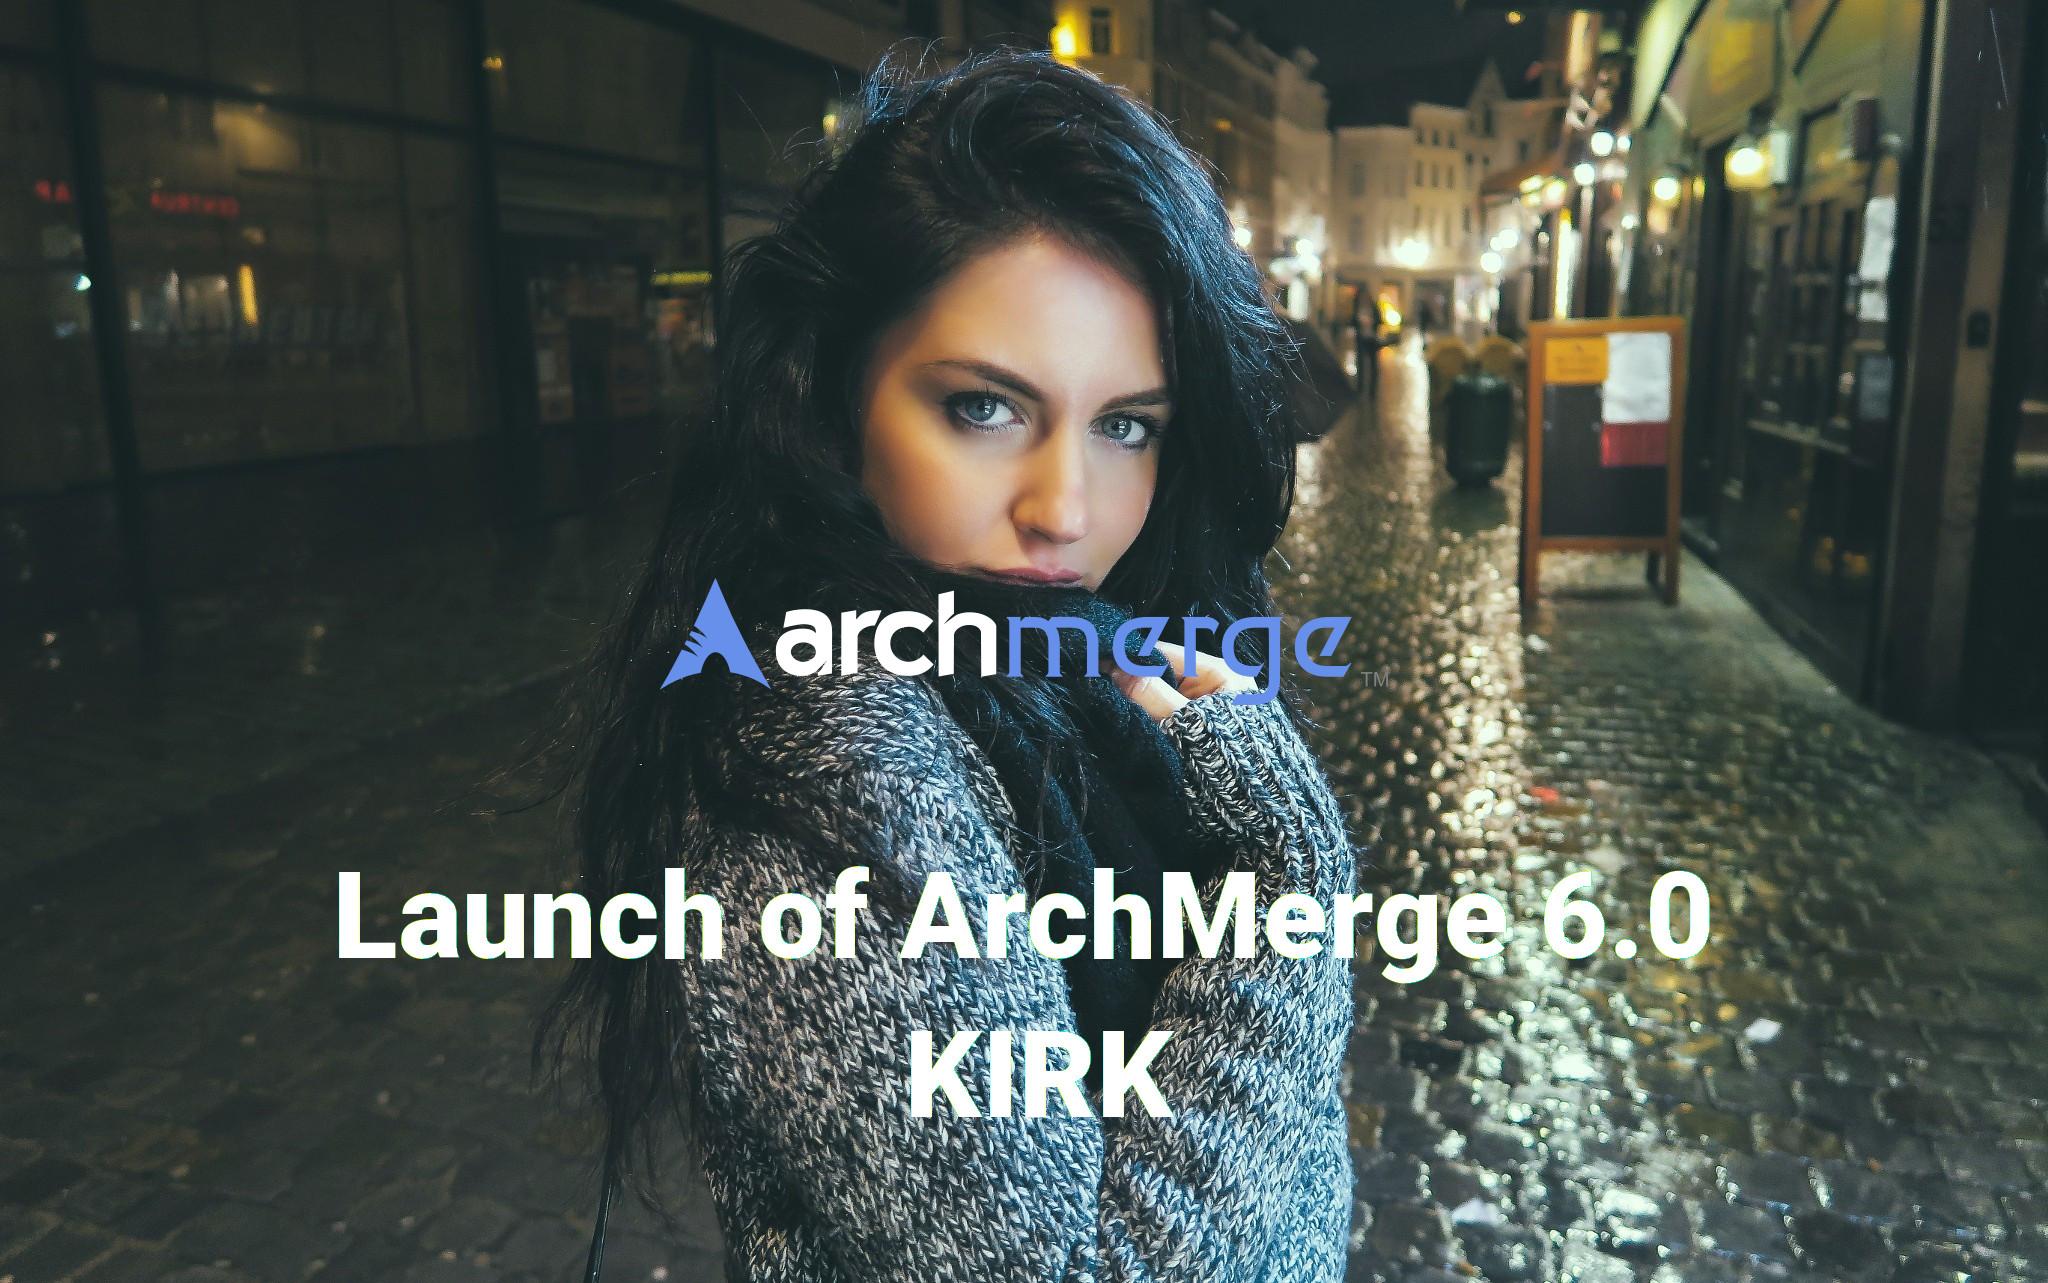 ArchMerge Kirk Release 6.0